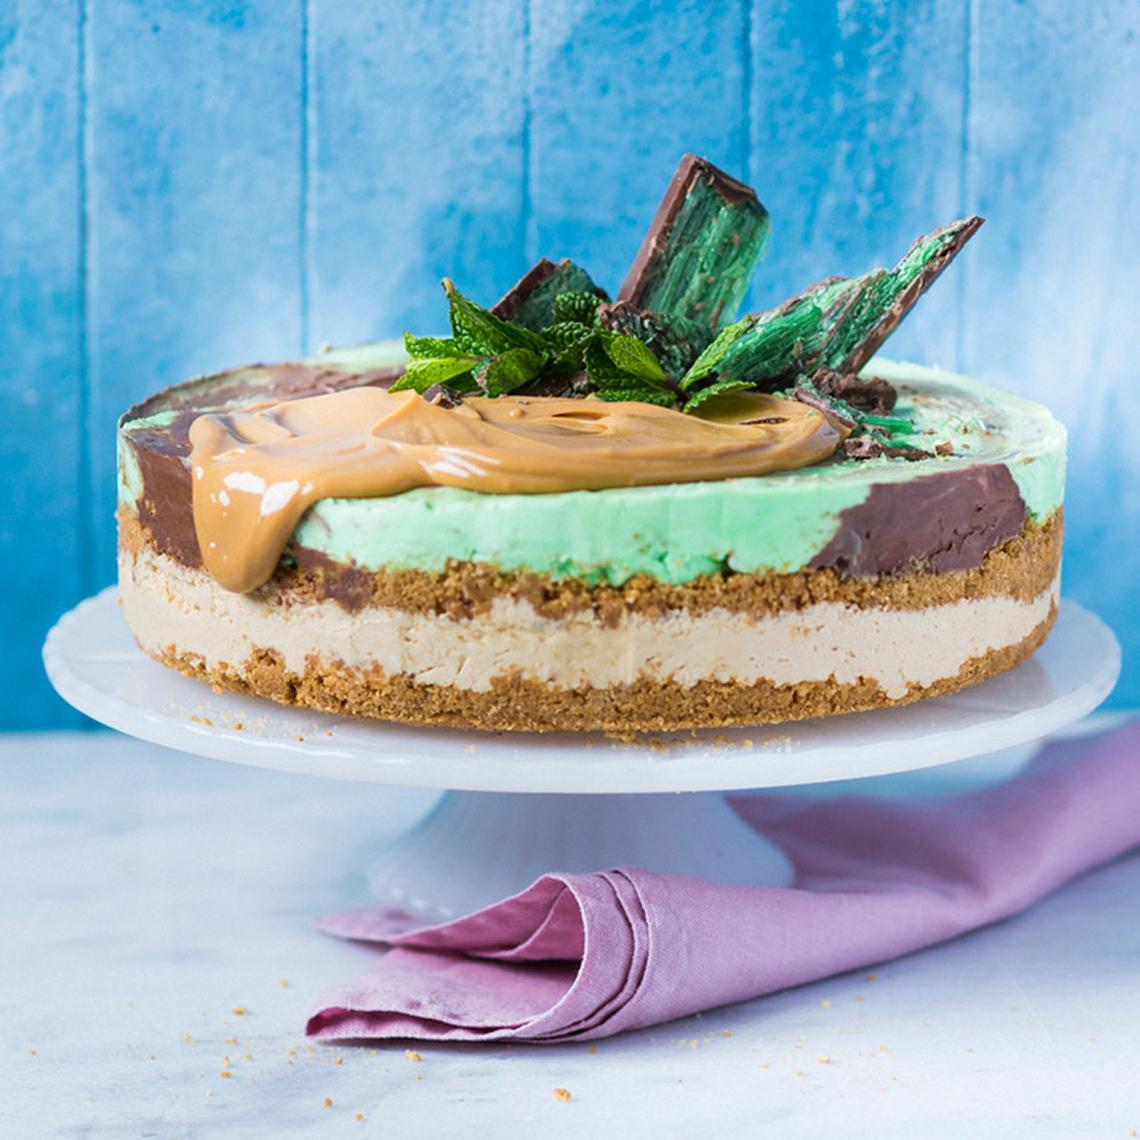 Peppermint Crisp® ice-cream cake